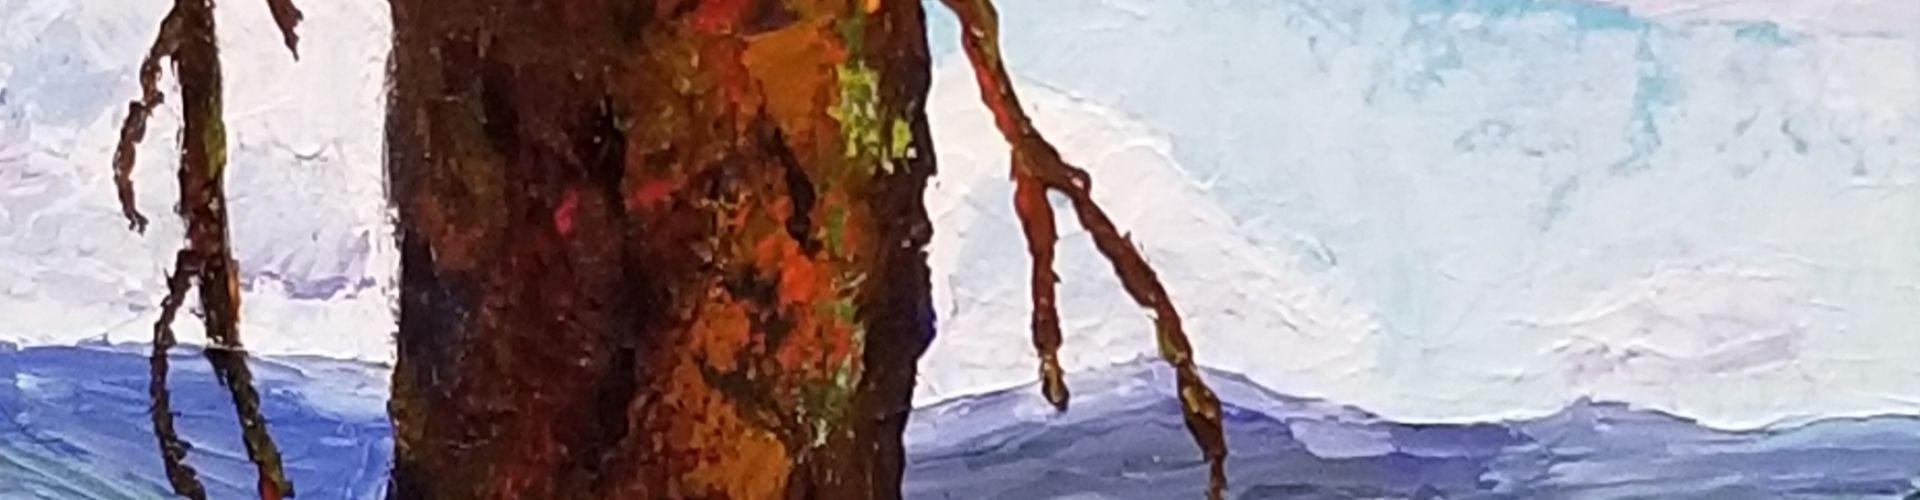 Ponderosa Pine on Crystal Mountain painting by Linda Lovisa